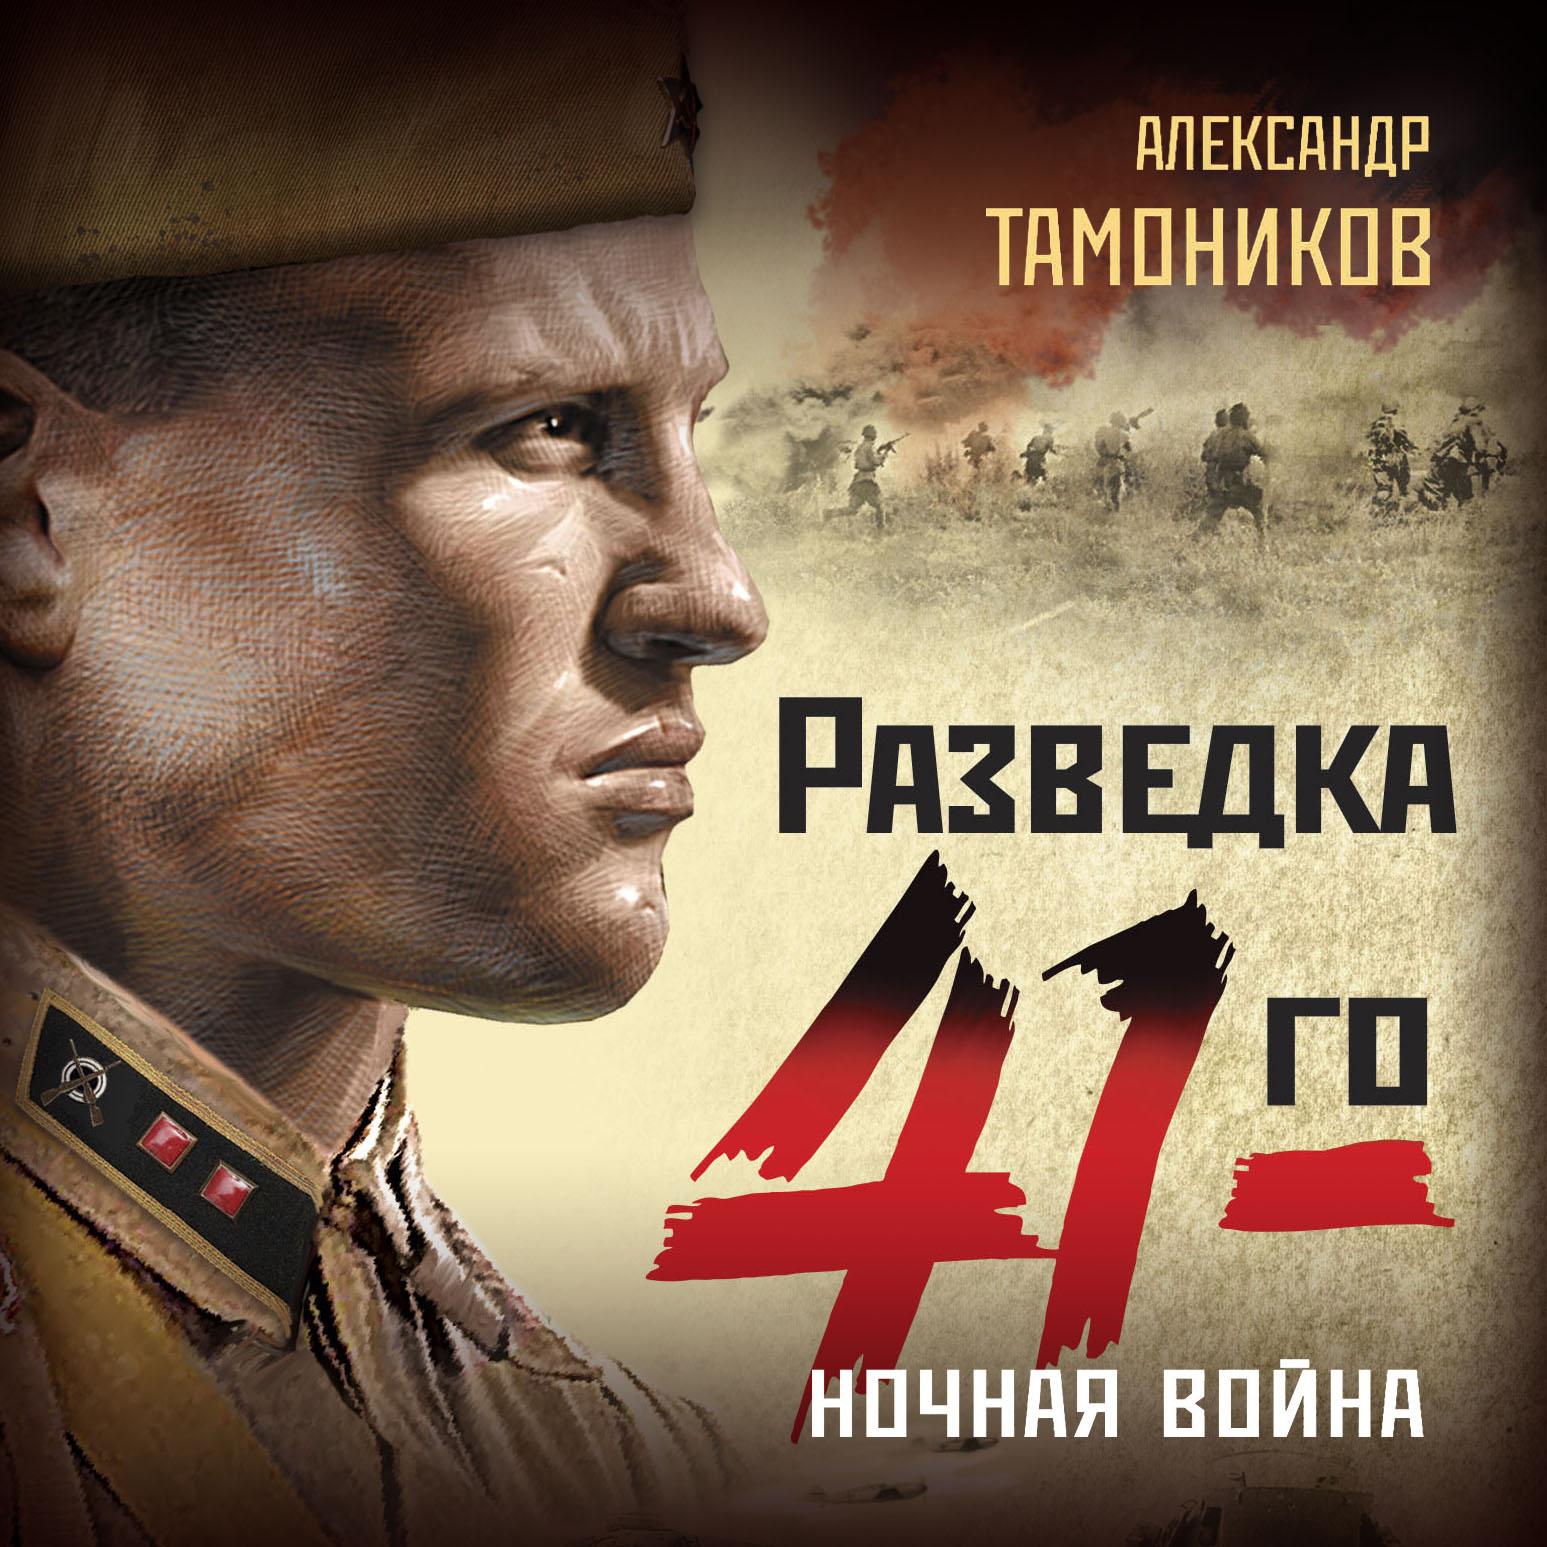 Купить книгу Ночная война, автора Александра Тамоникова